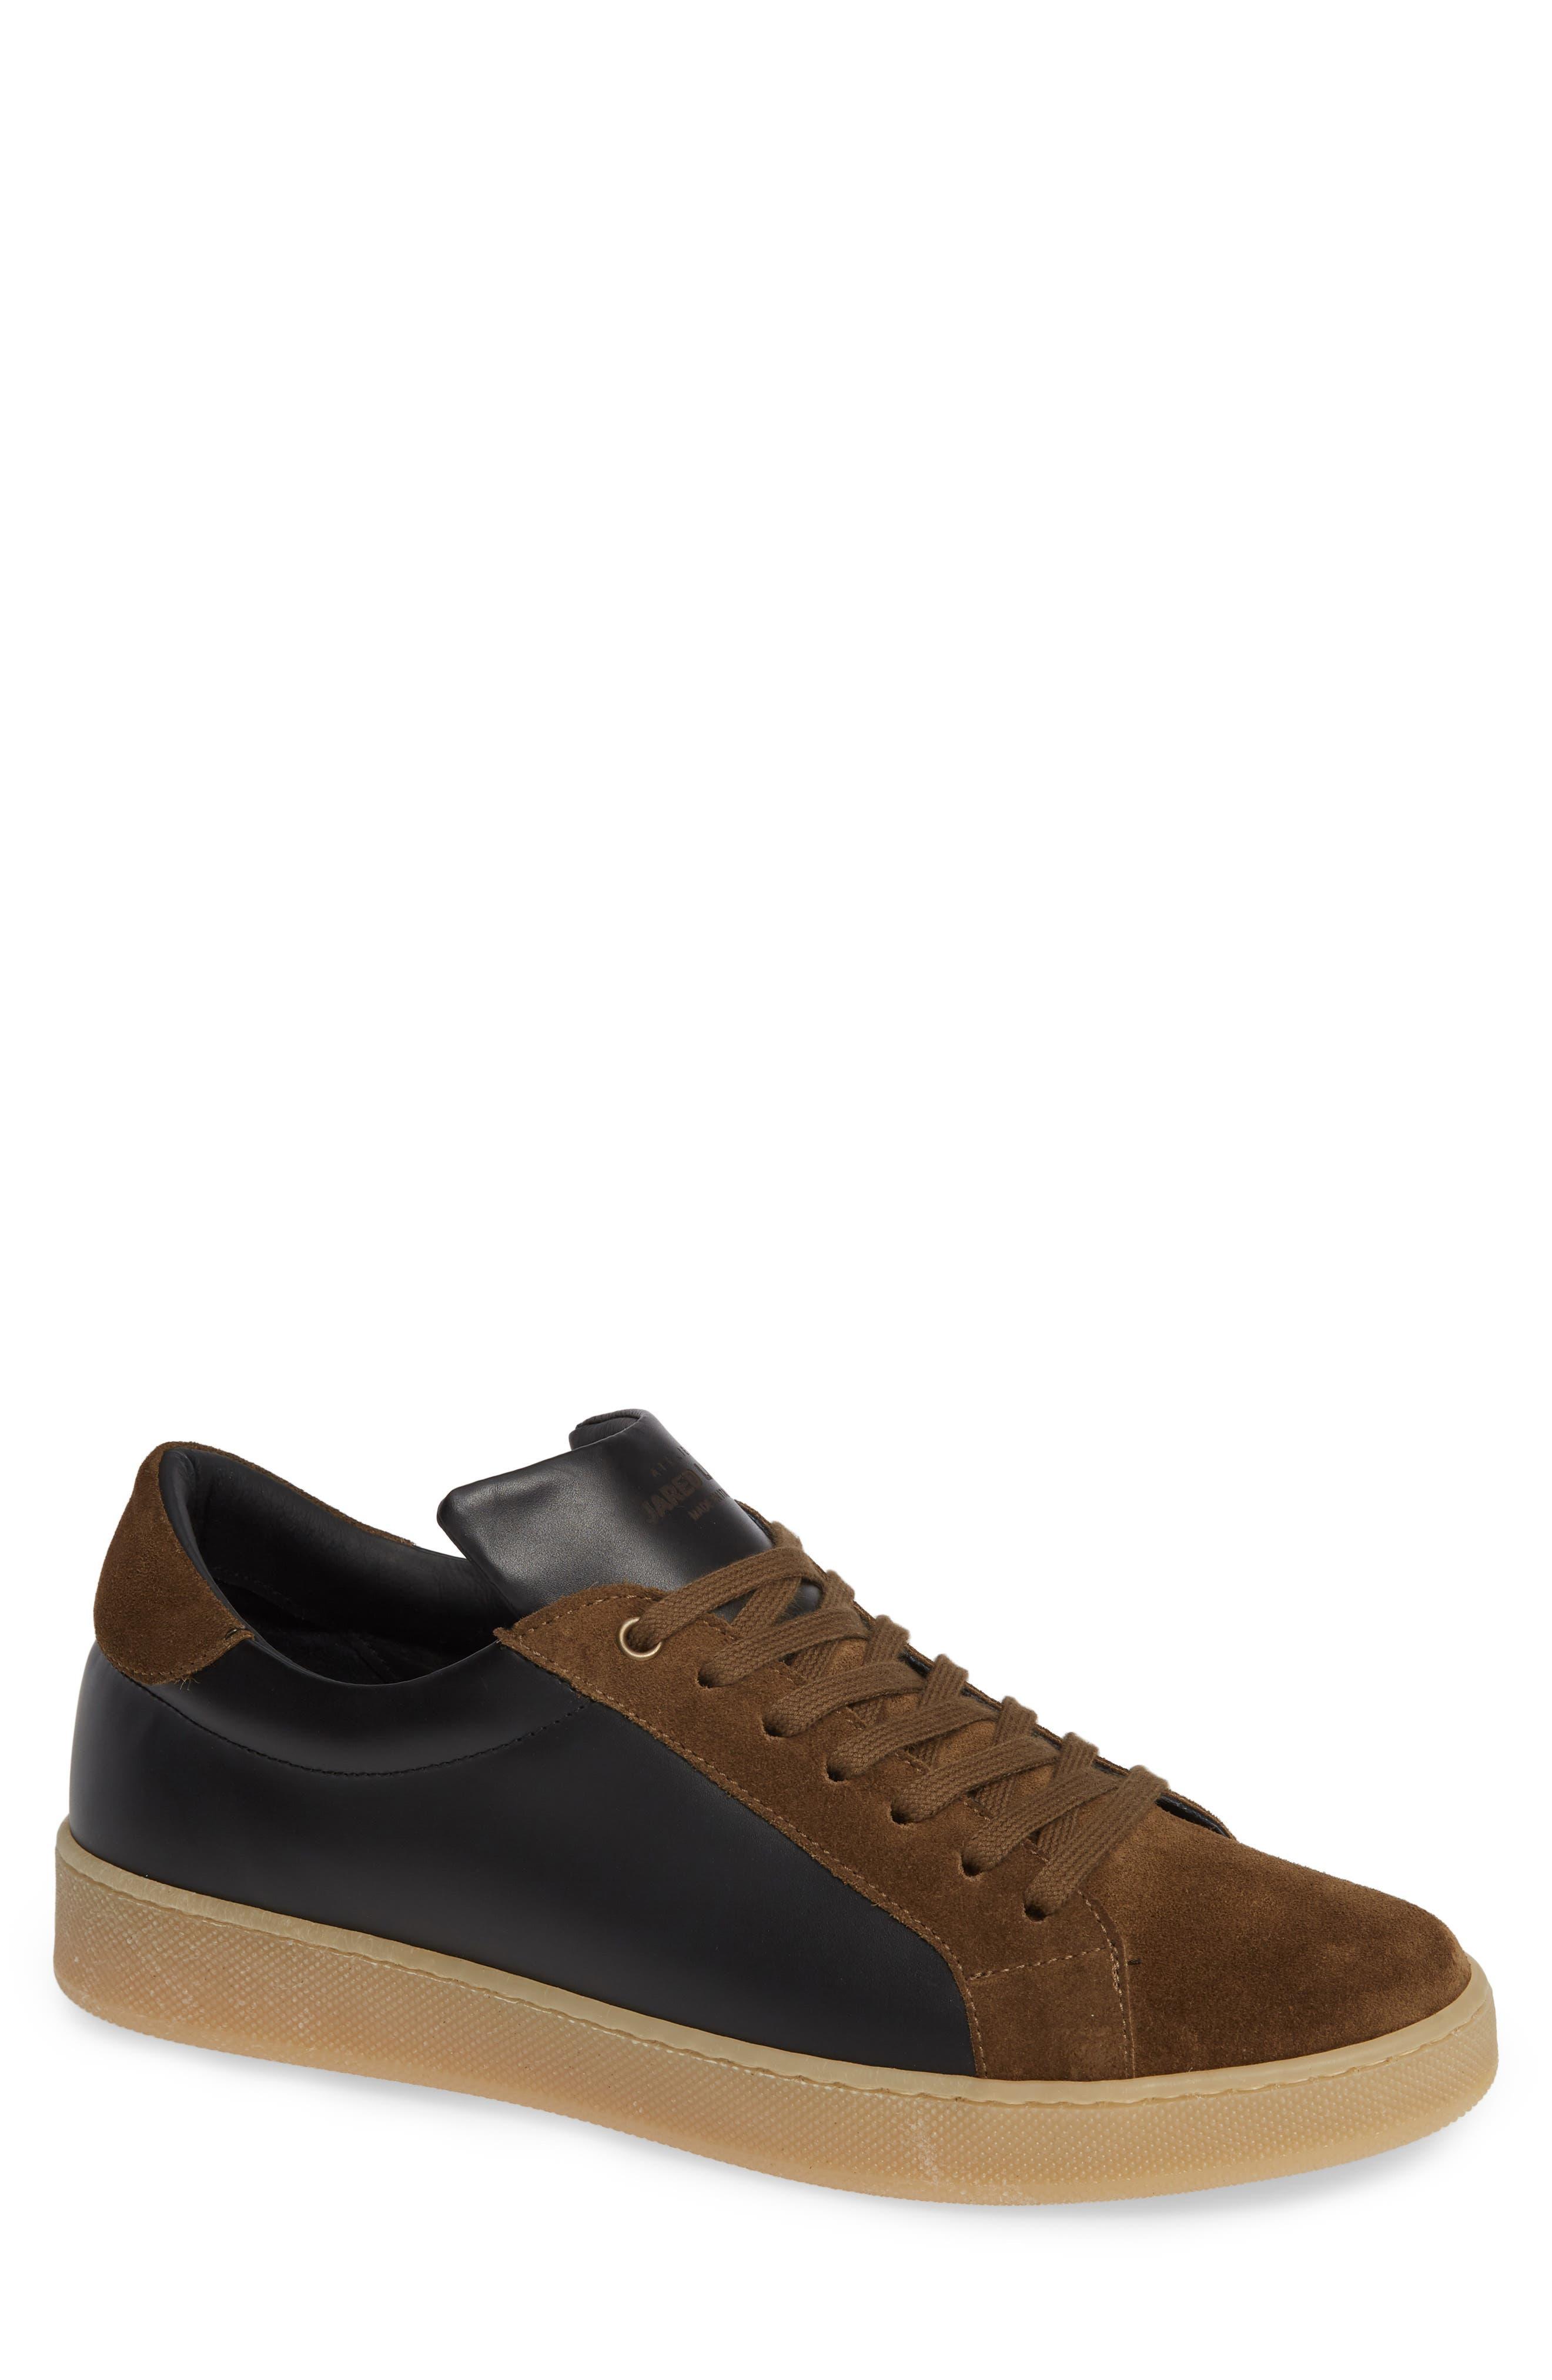 Rome Sneaker,                         Main,                         color, BLACK/ GEIGE